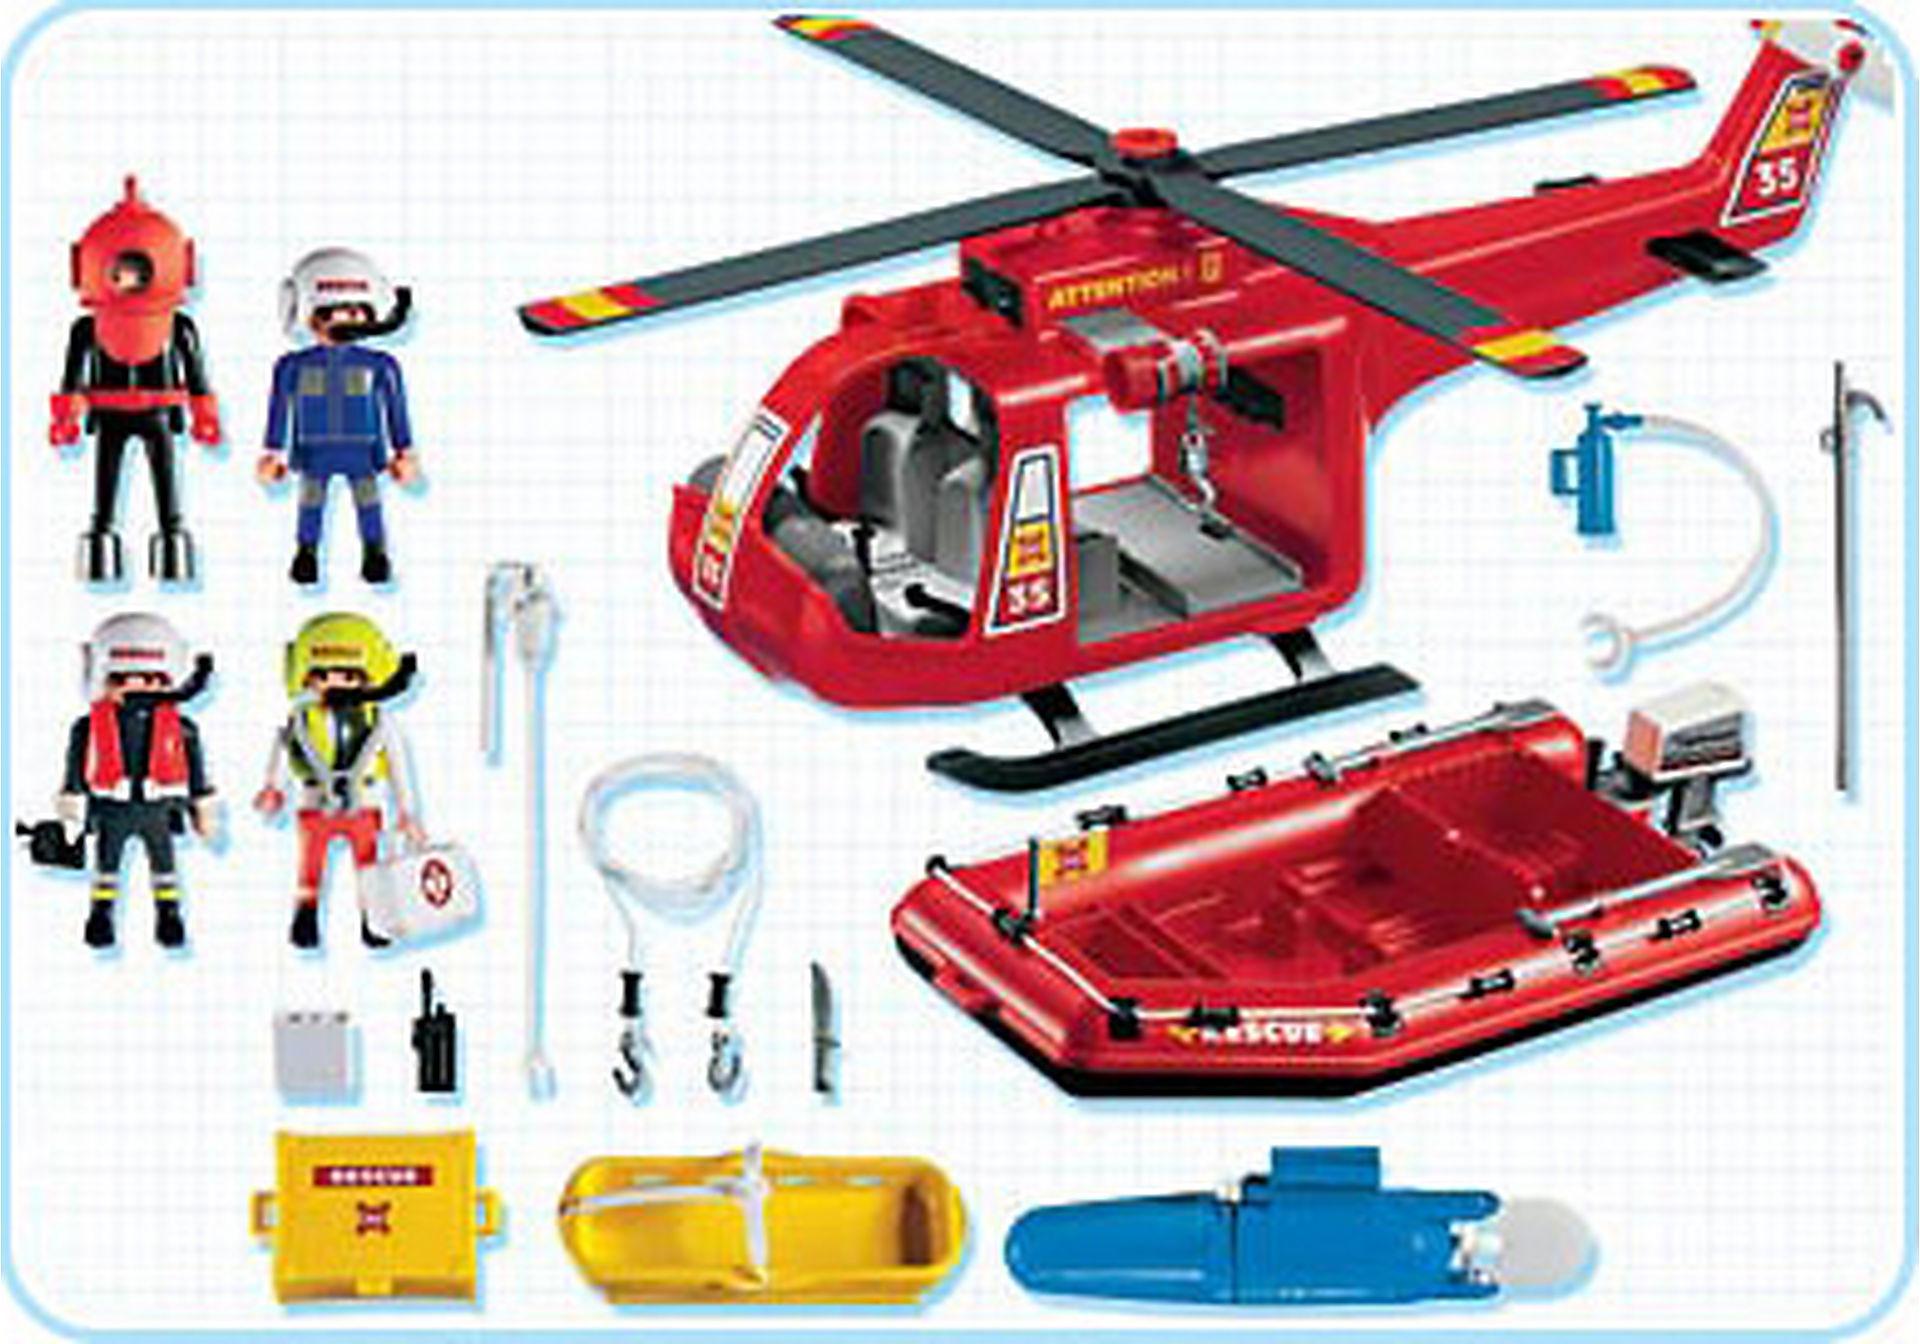 4428-A SOS-Helikopter/Rettungsboot zoom image2